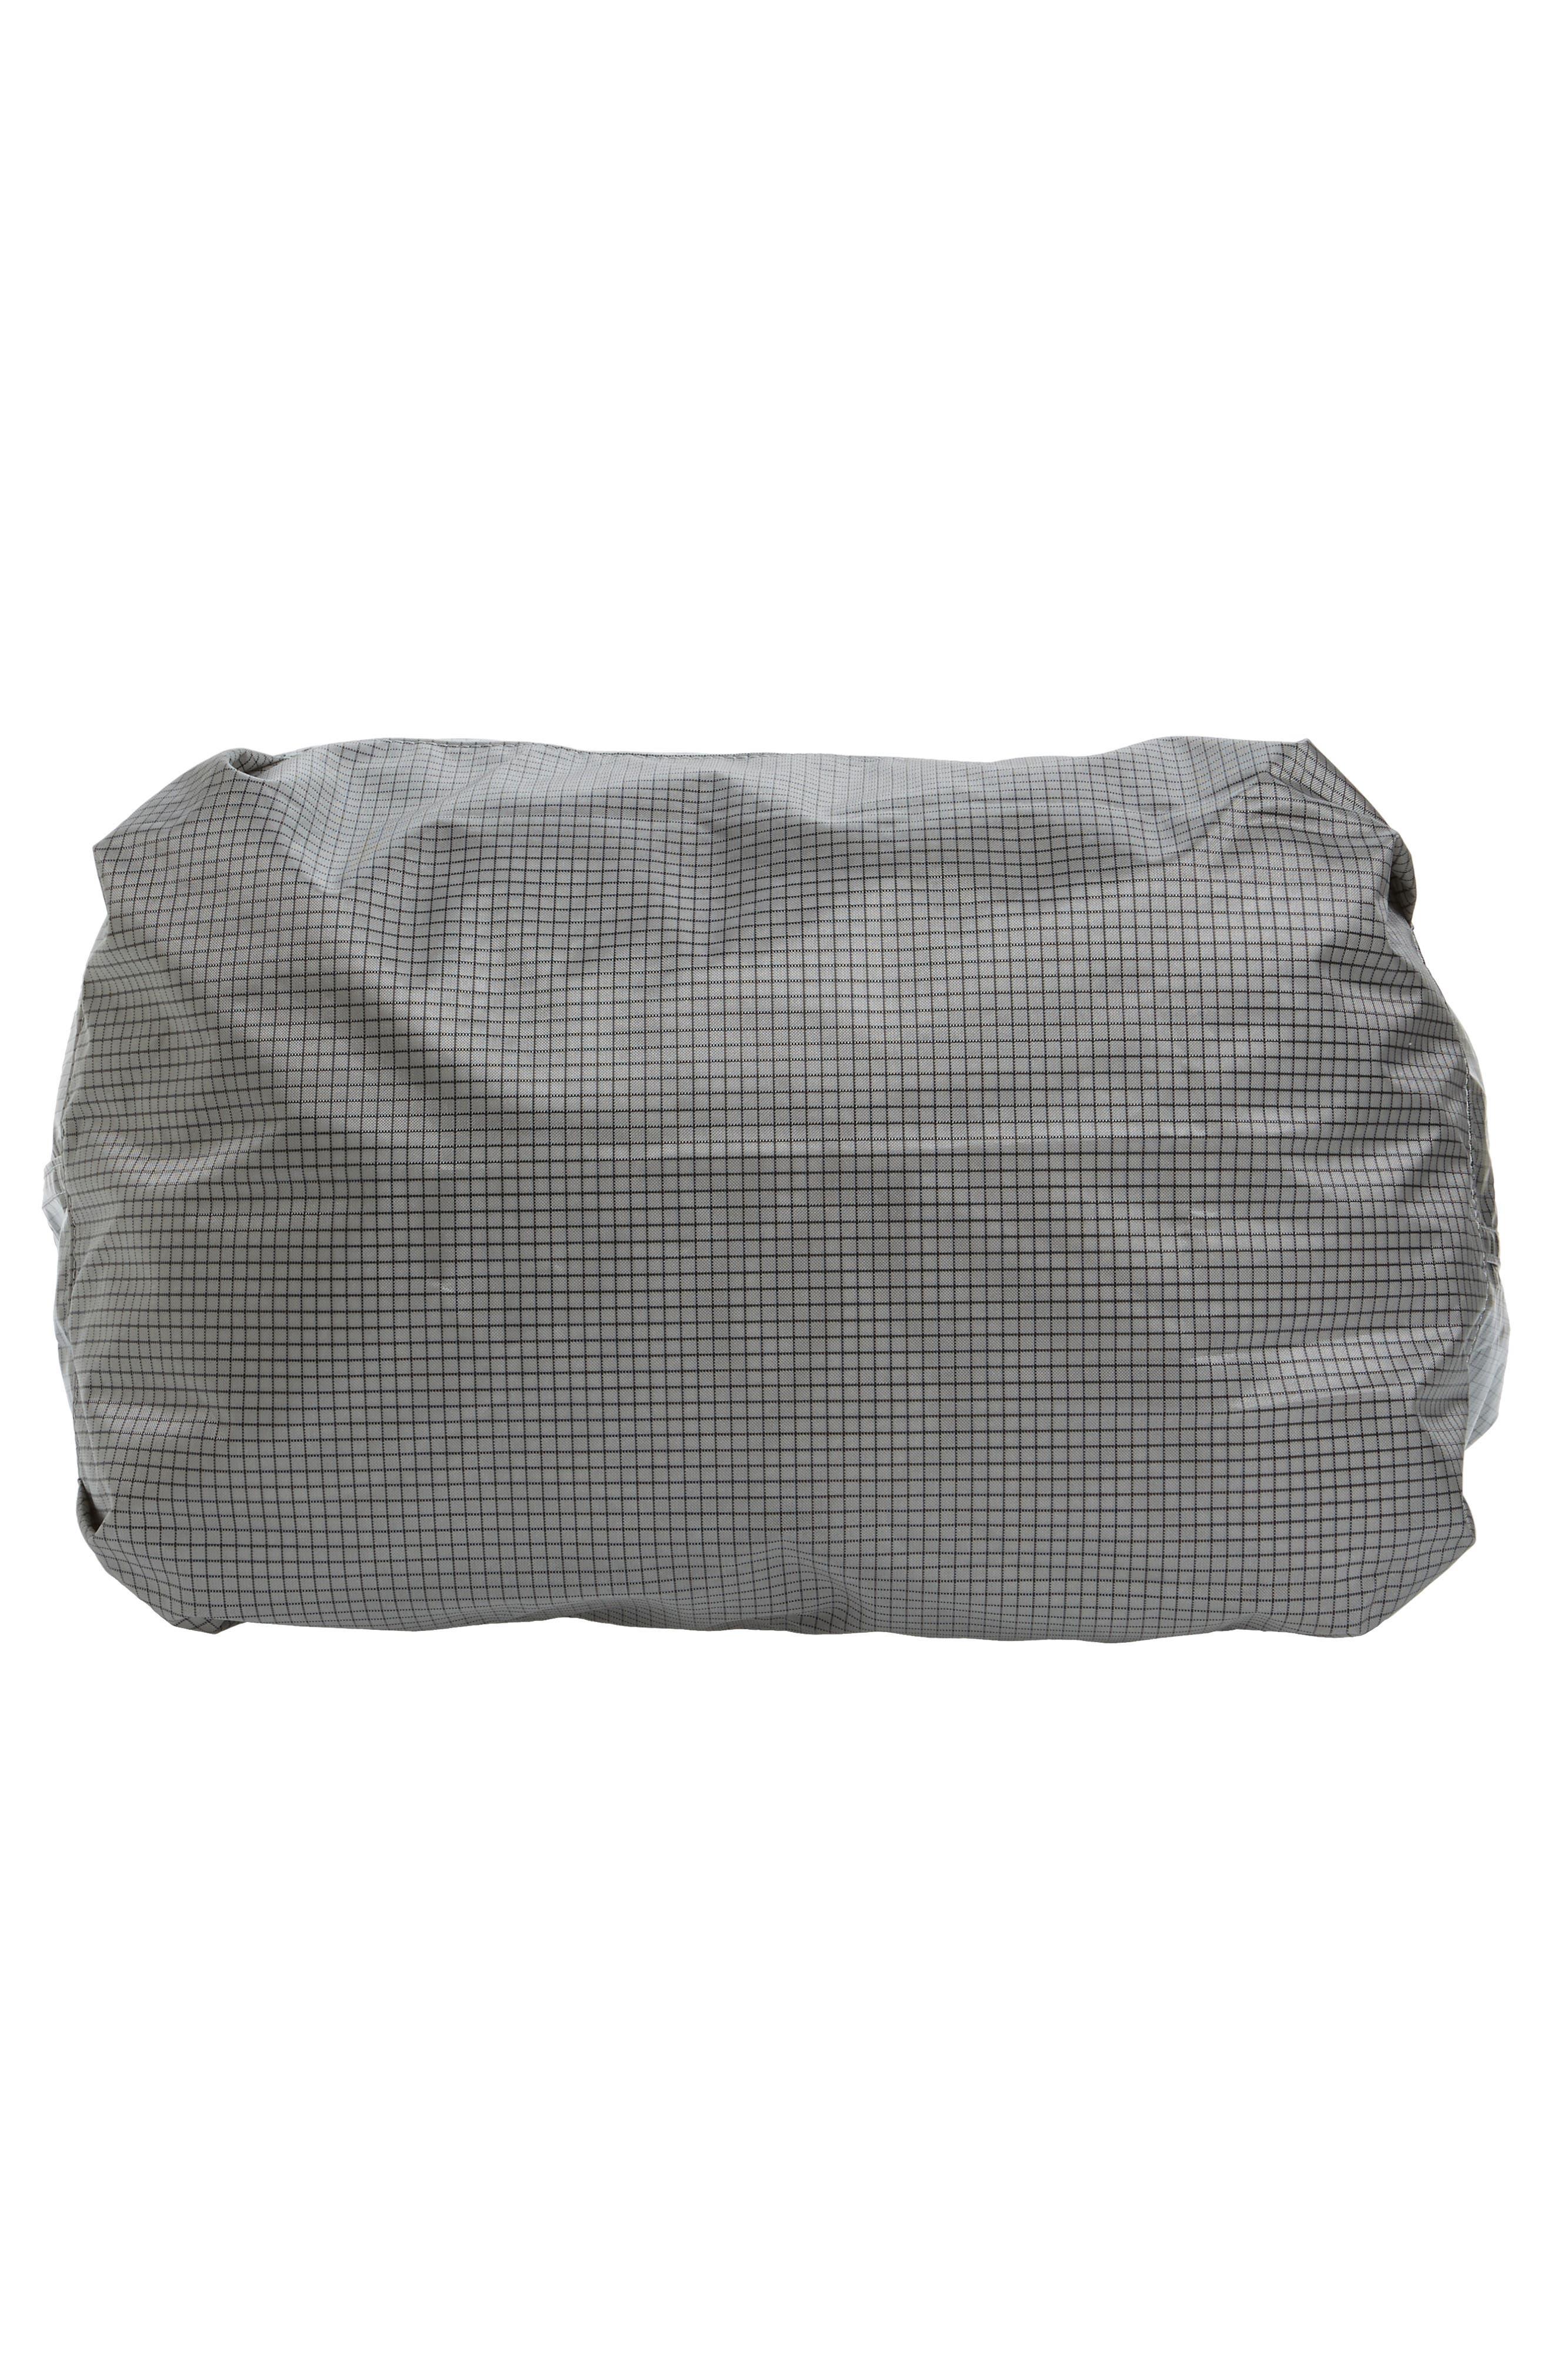 Lightweight Black Hole Gear Tote Bag,                             Alternate thumbnail 6, color,                             020